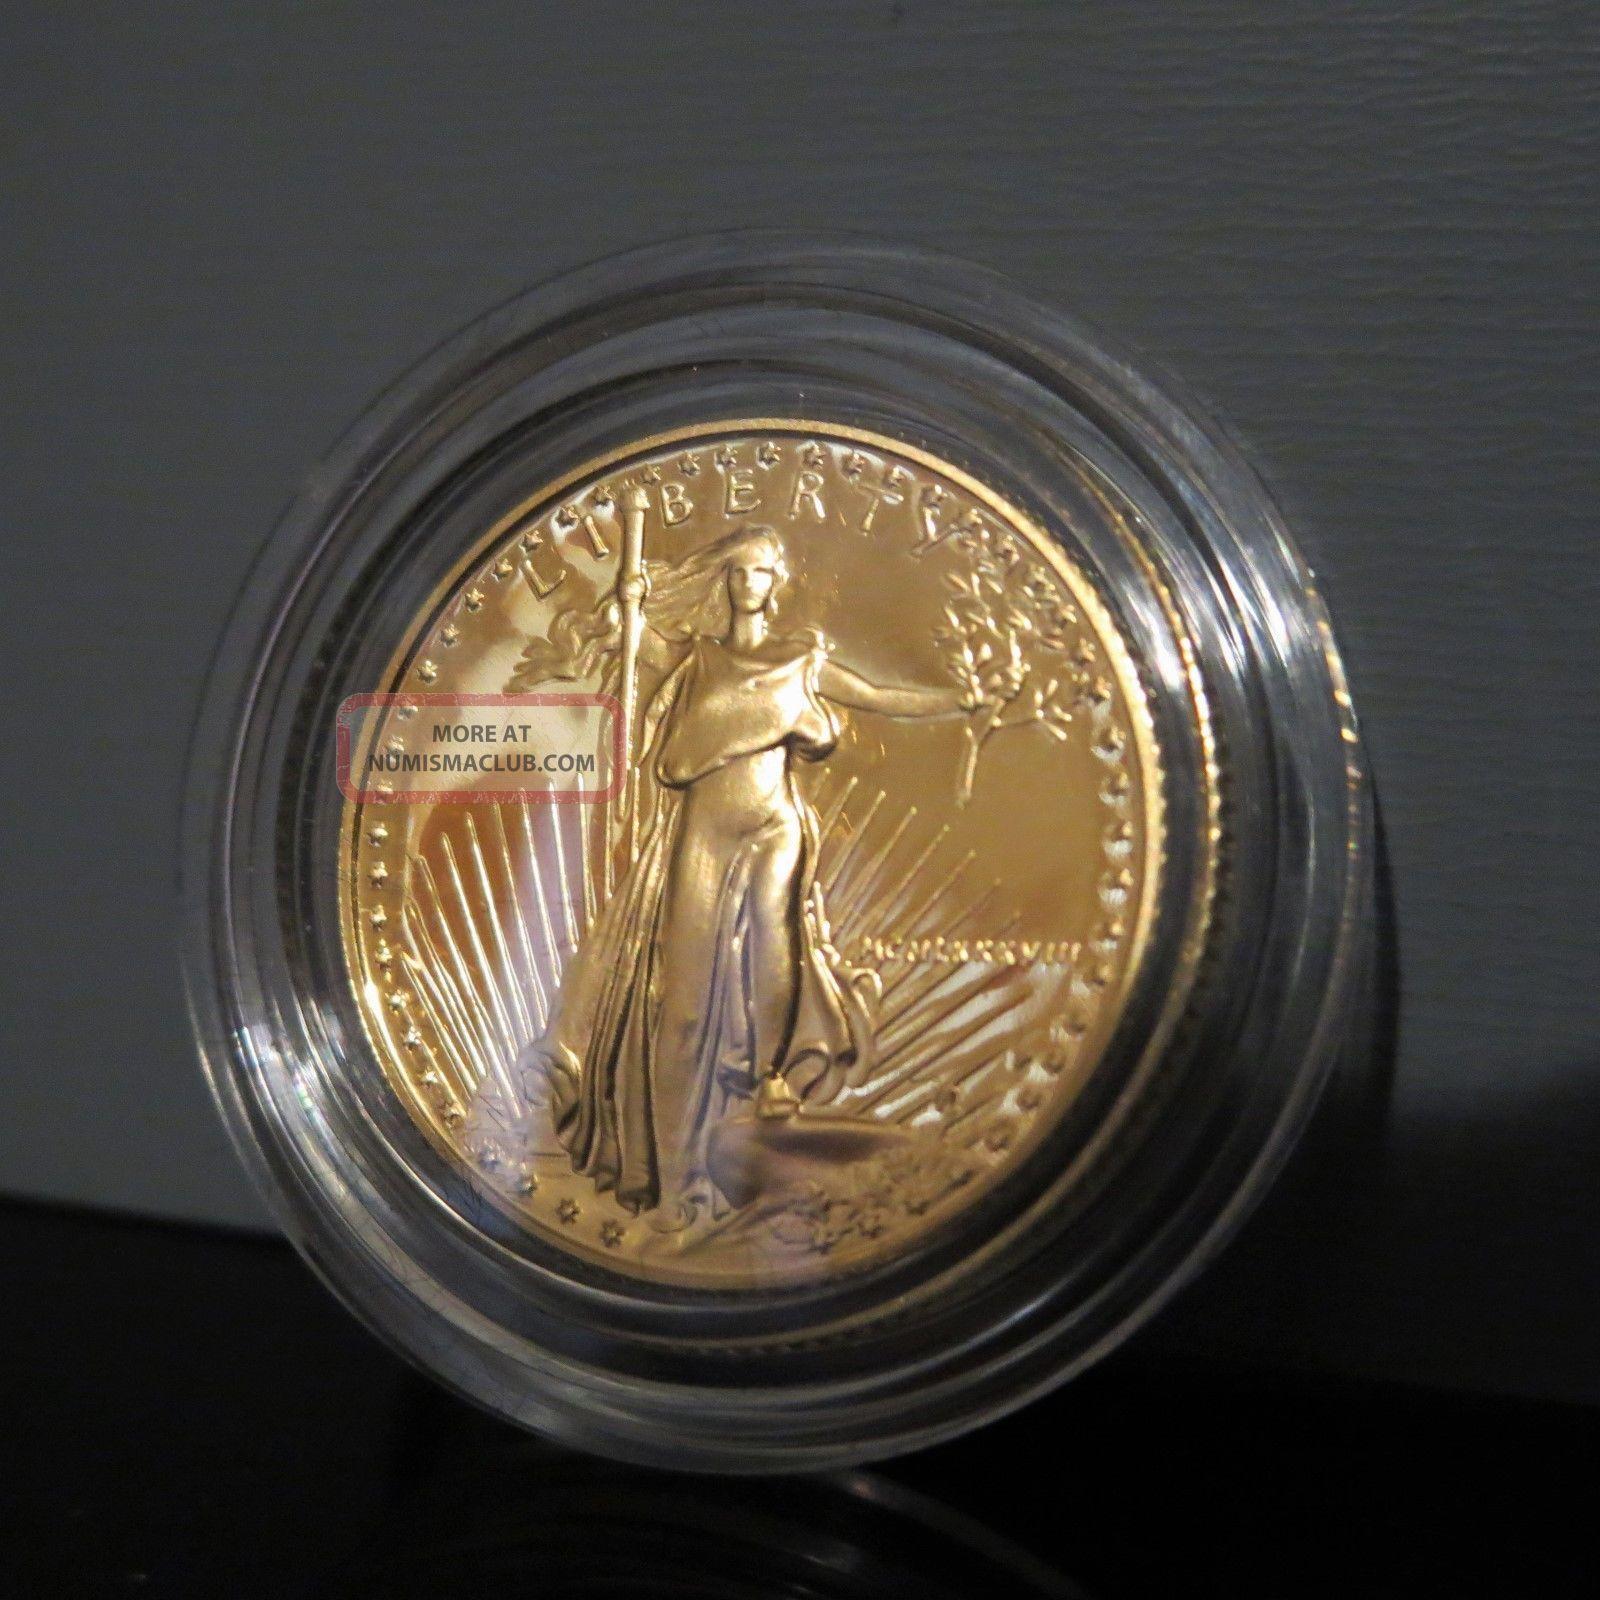 1988 P American Eagle Liberty 10 Us 1 4 Oz Proof Gold